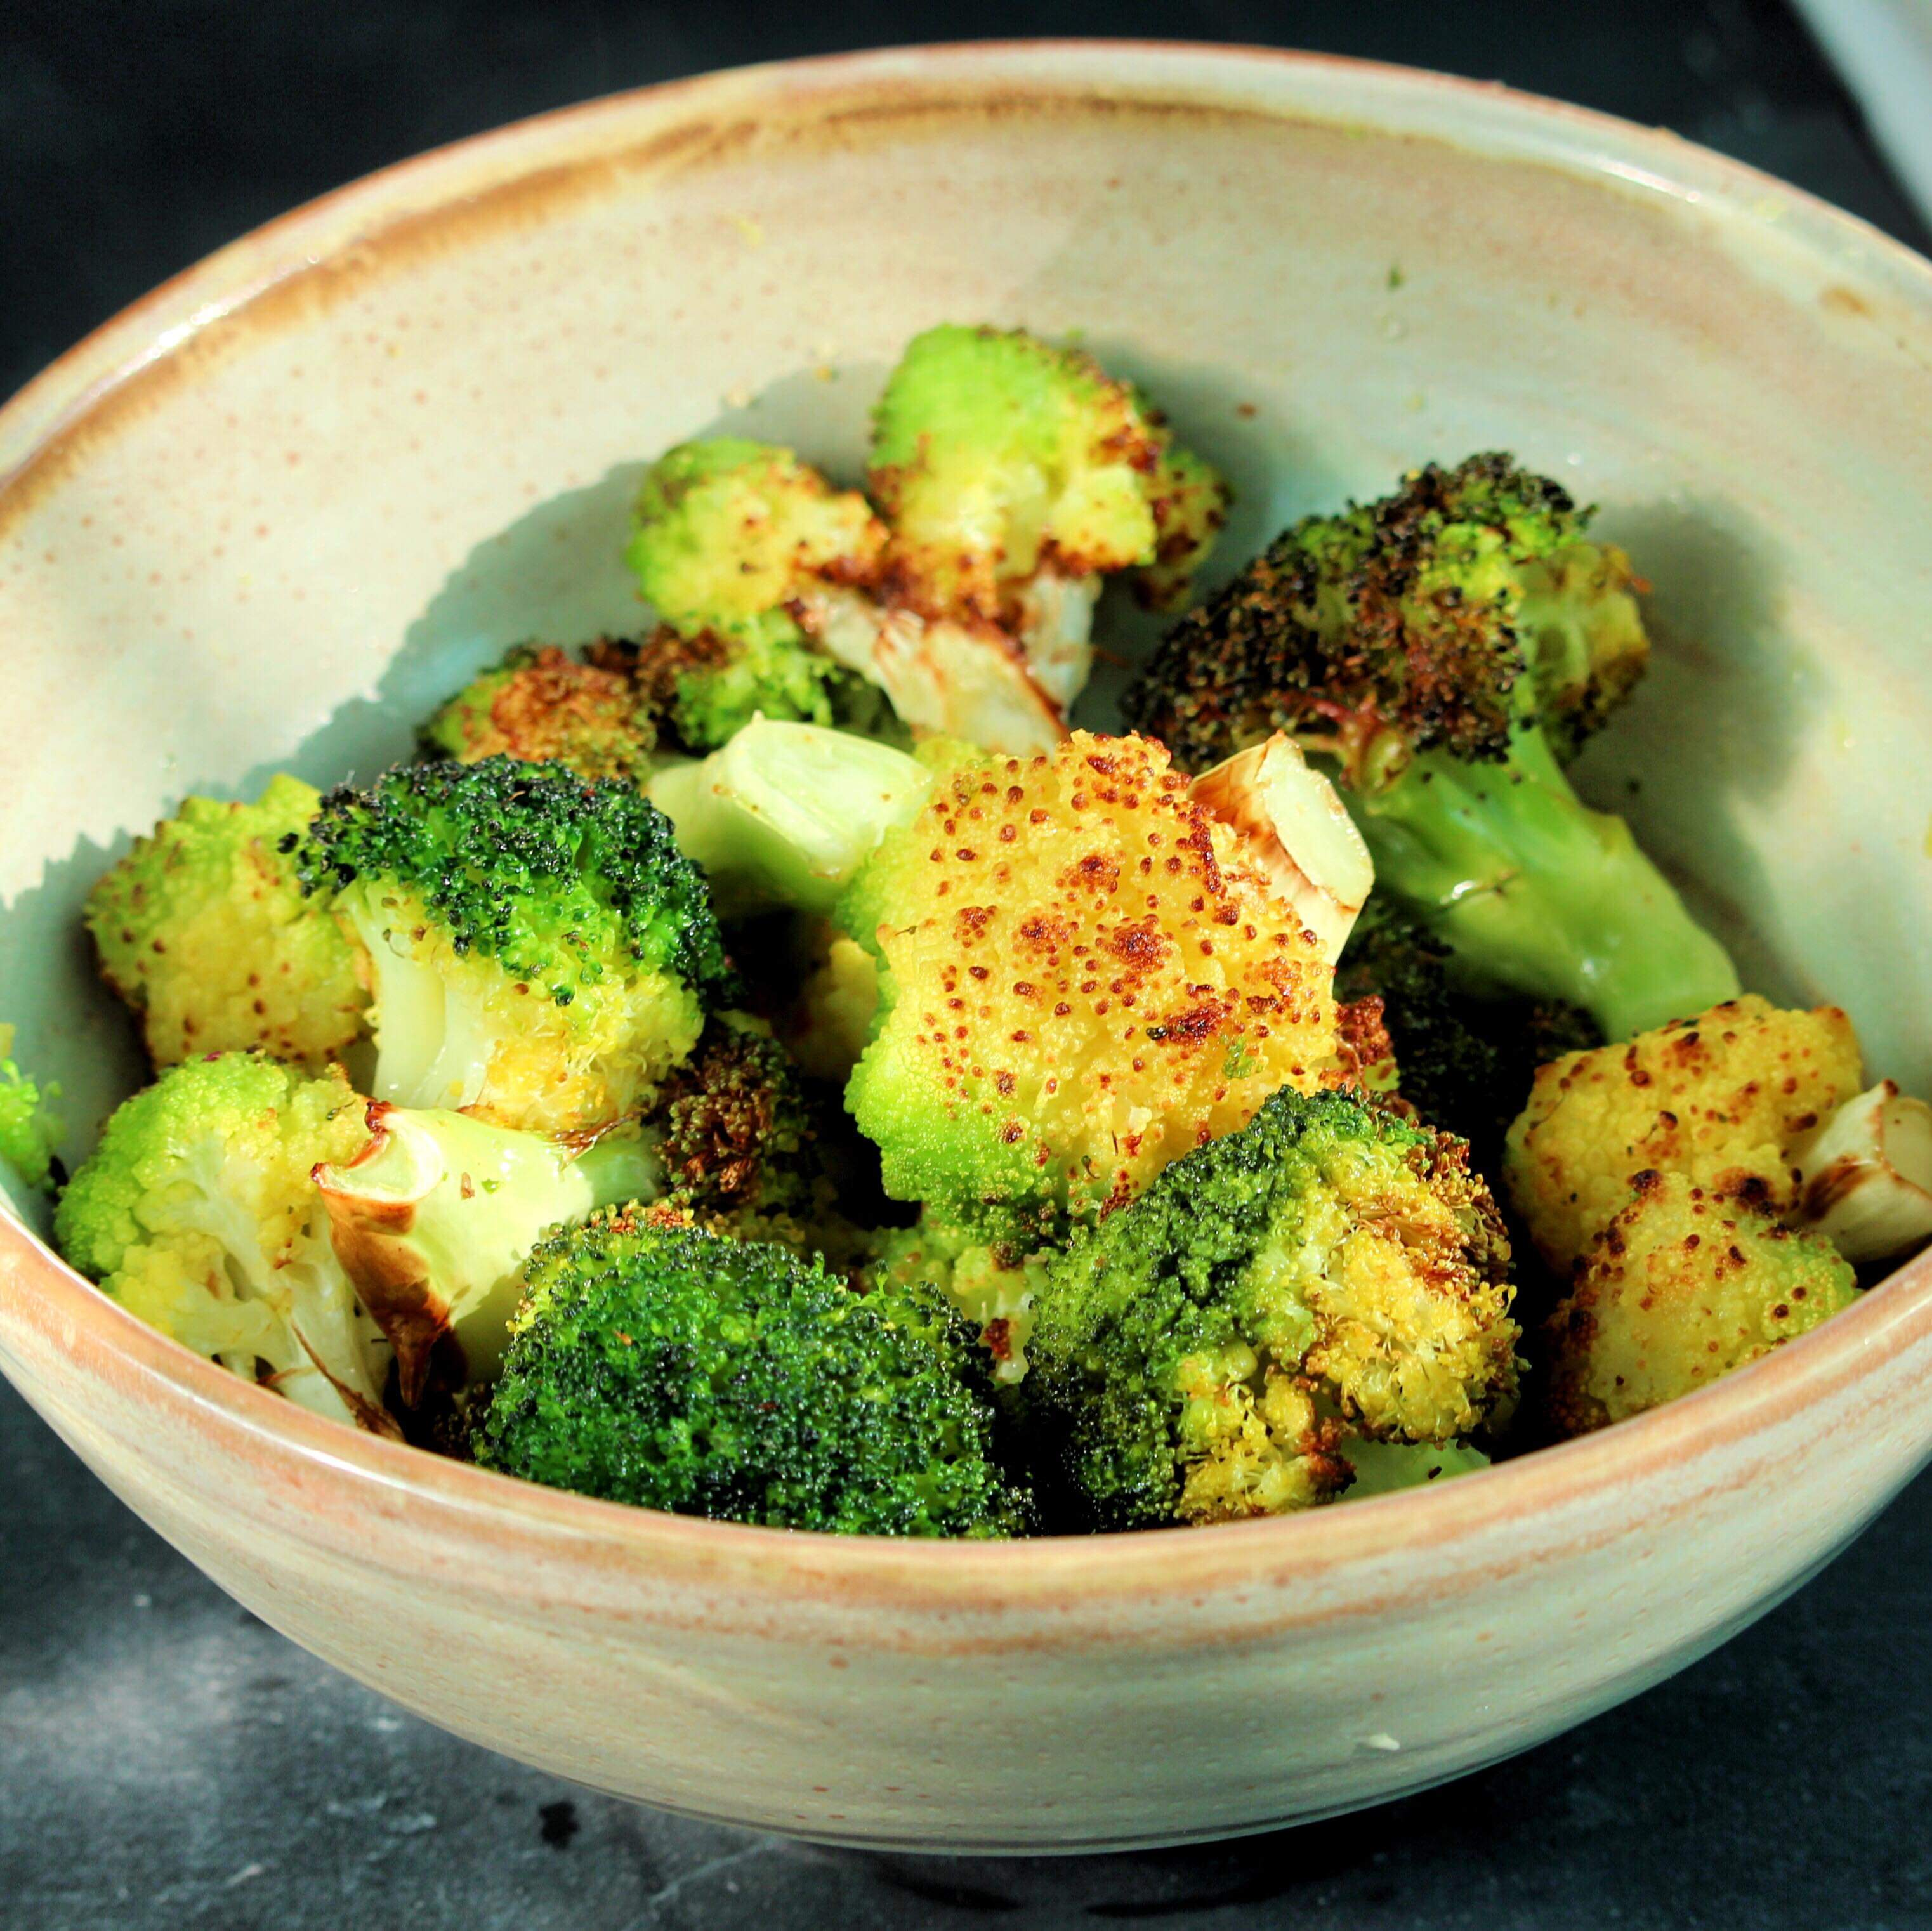 Air Fryer Roasted Broccoli and Cauliflower